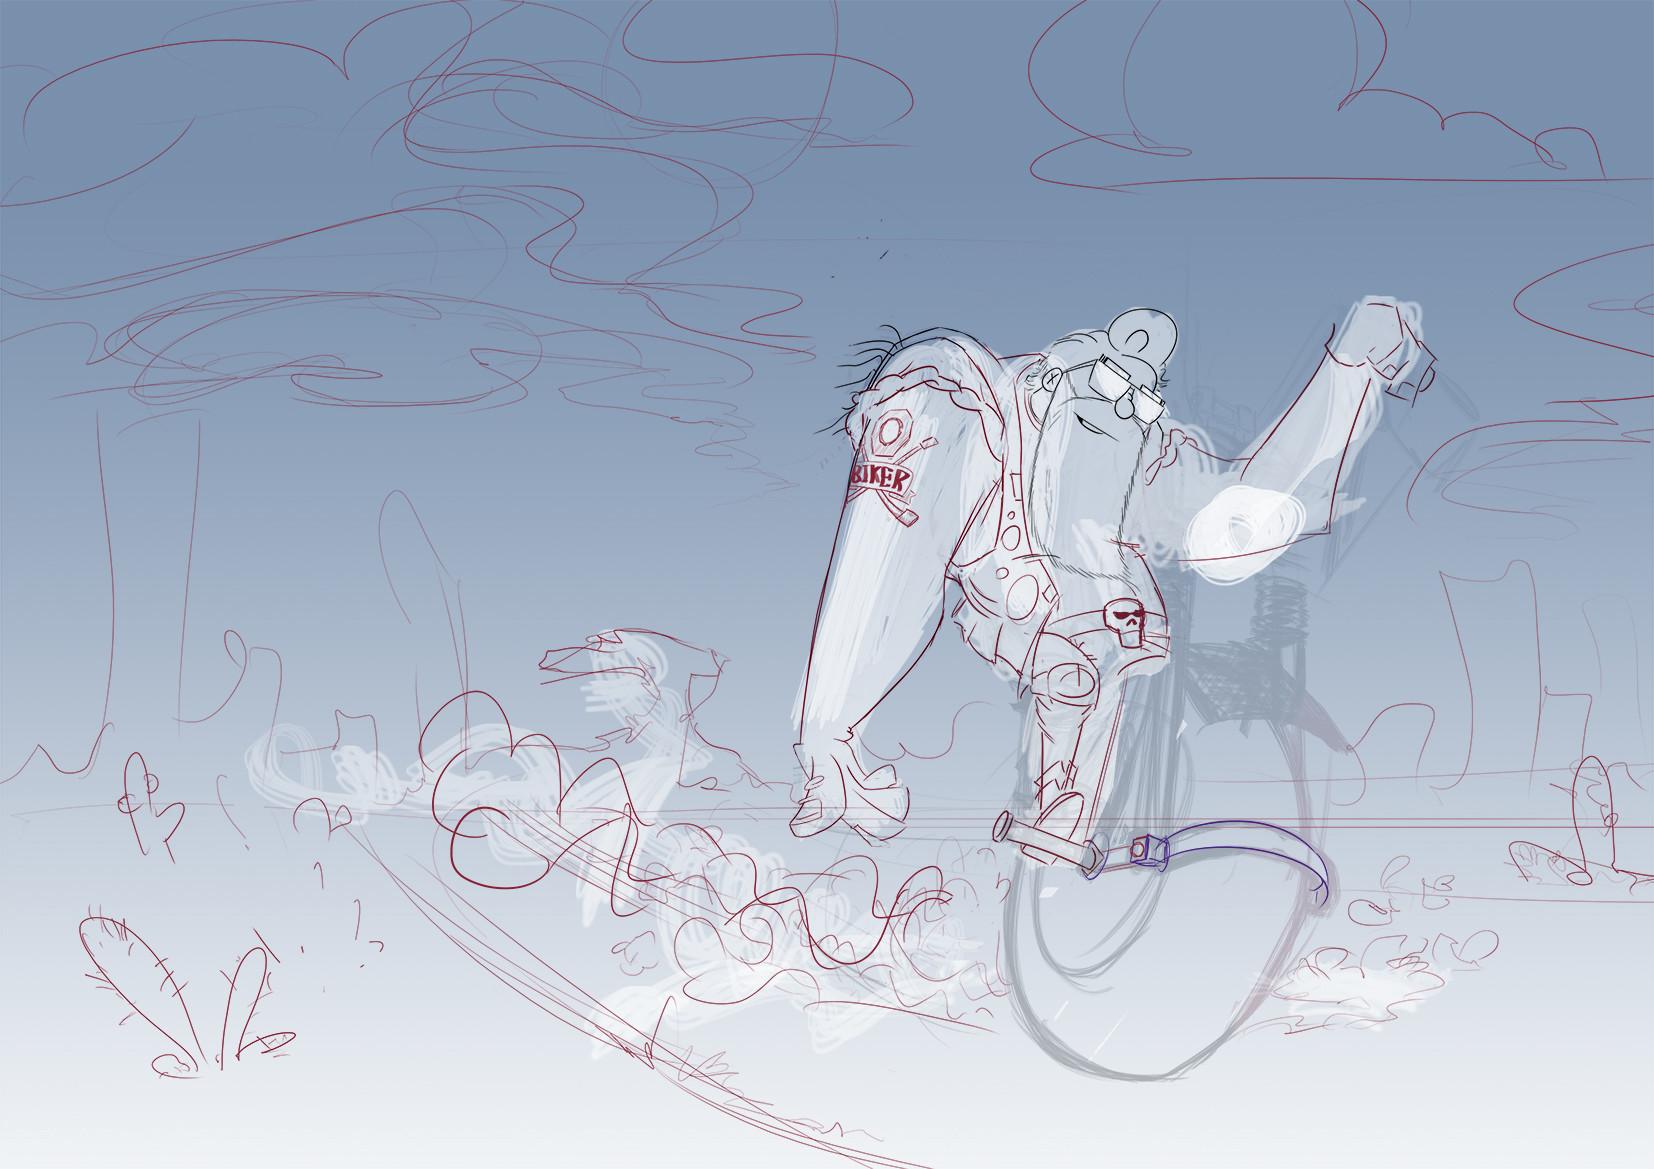 Mariano musante biker sktch05